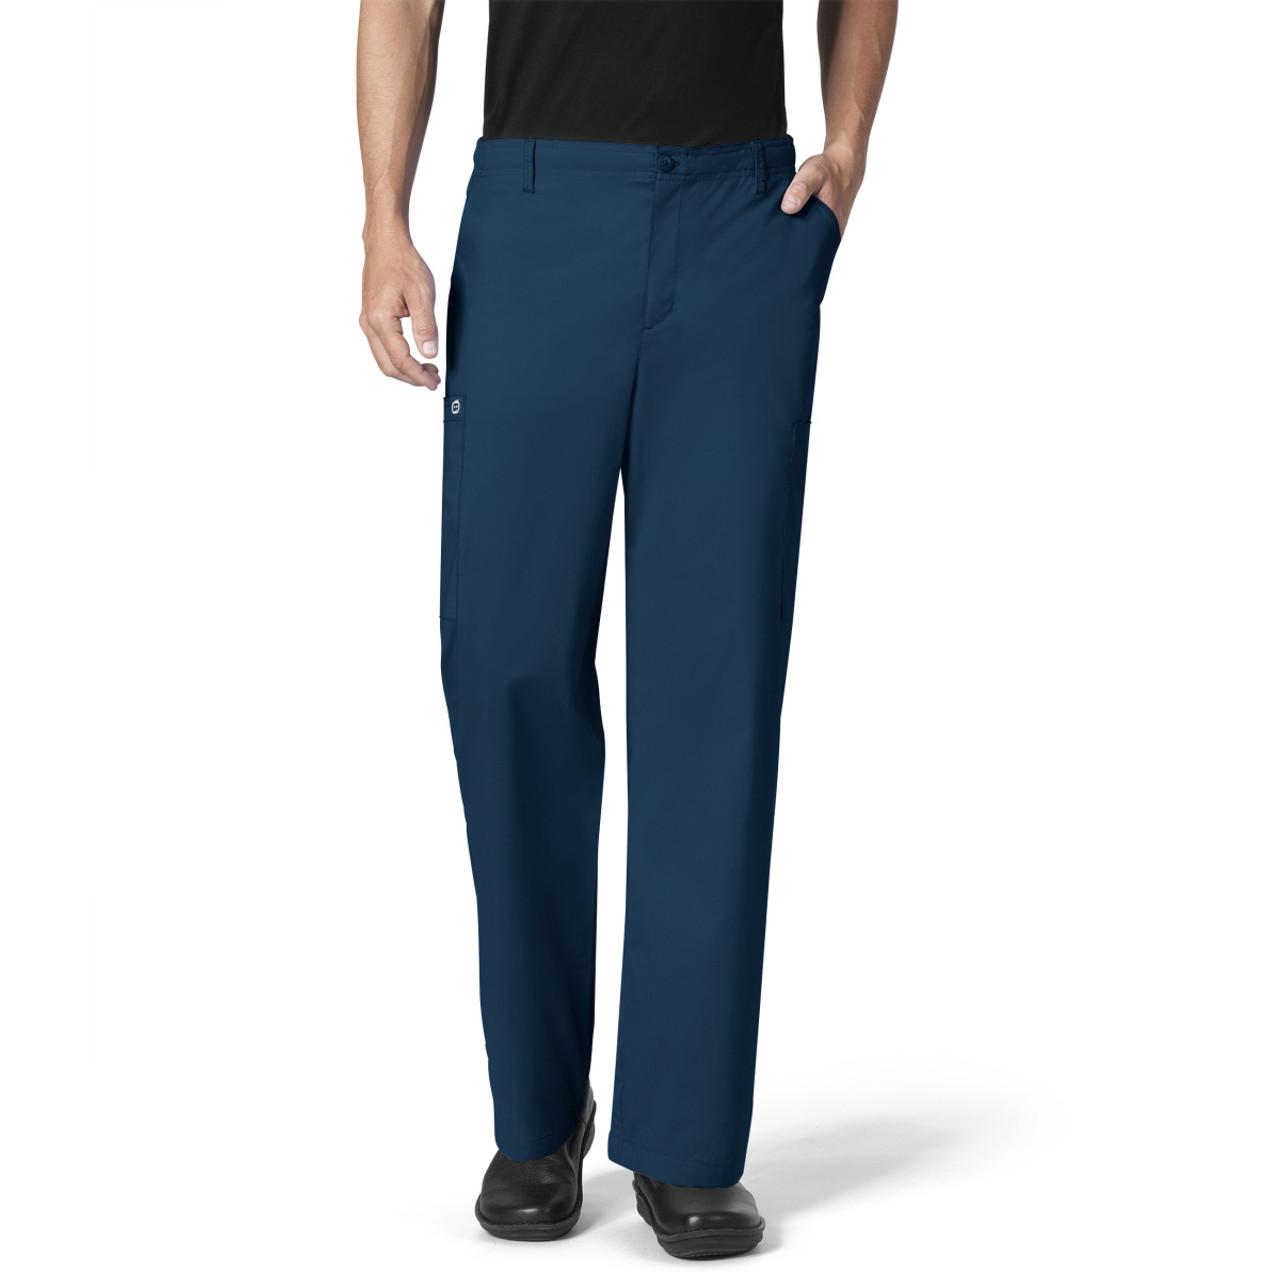 0d91032ceeea (503S) WonderWink WonderWORK Mens Cargo Scrub Pants (Short) ...